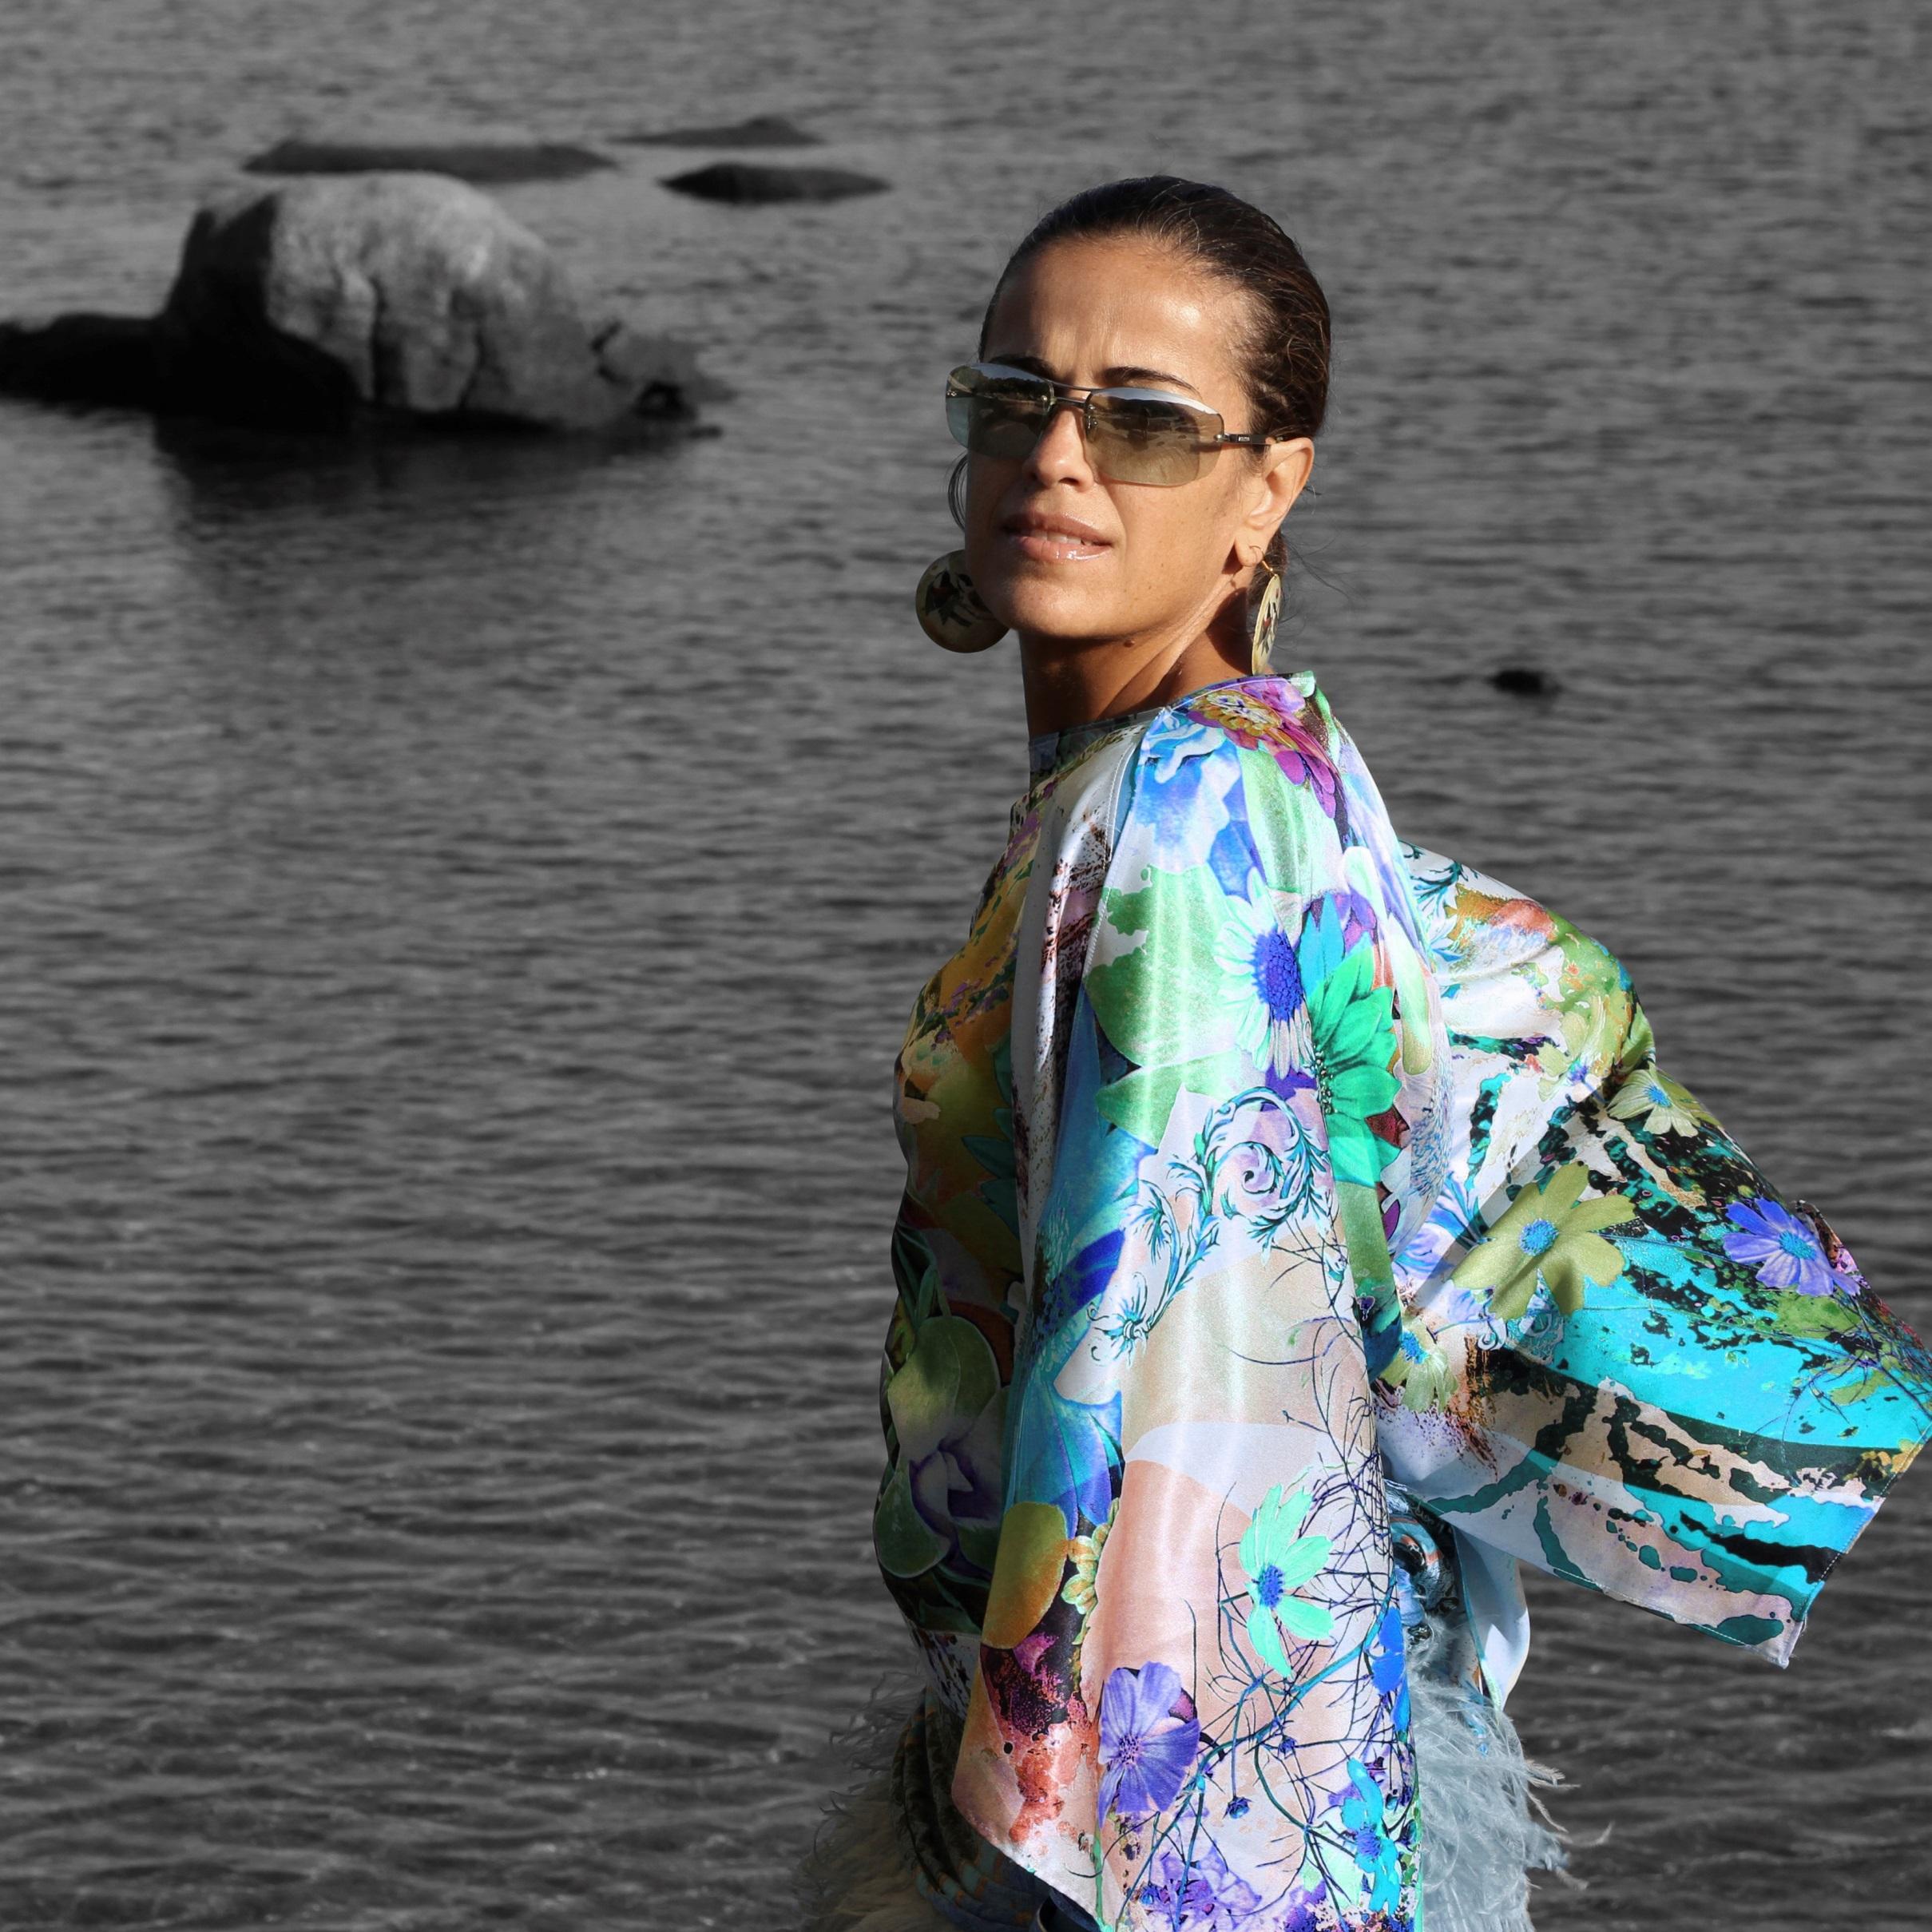 Camisa kimono comprada en Estambul